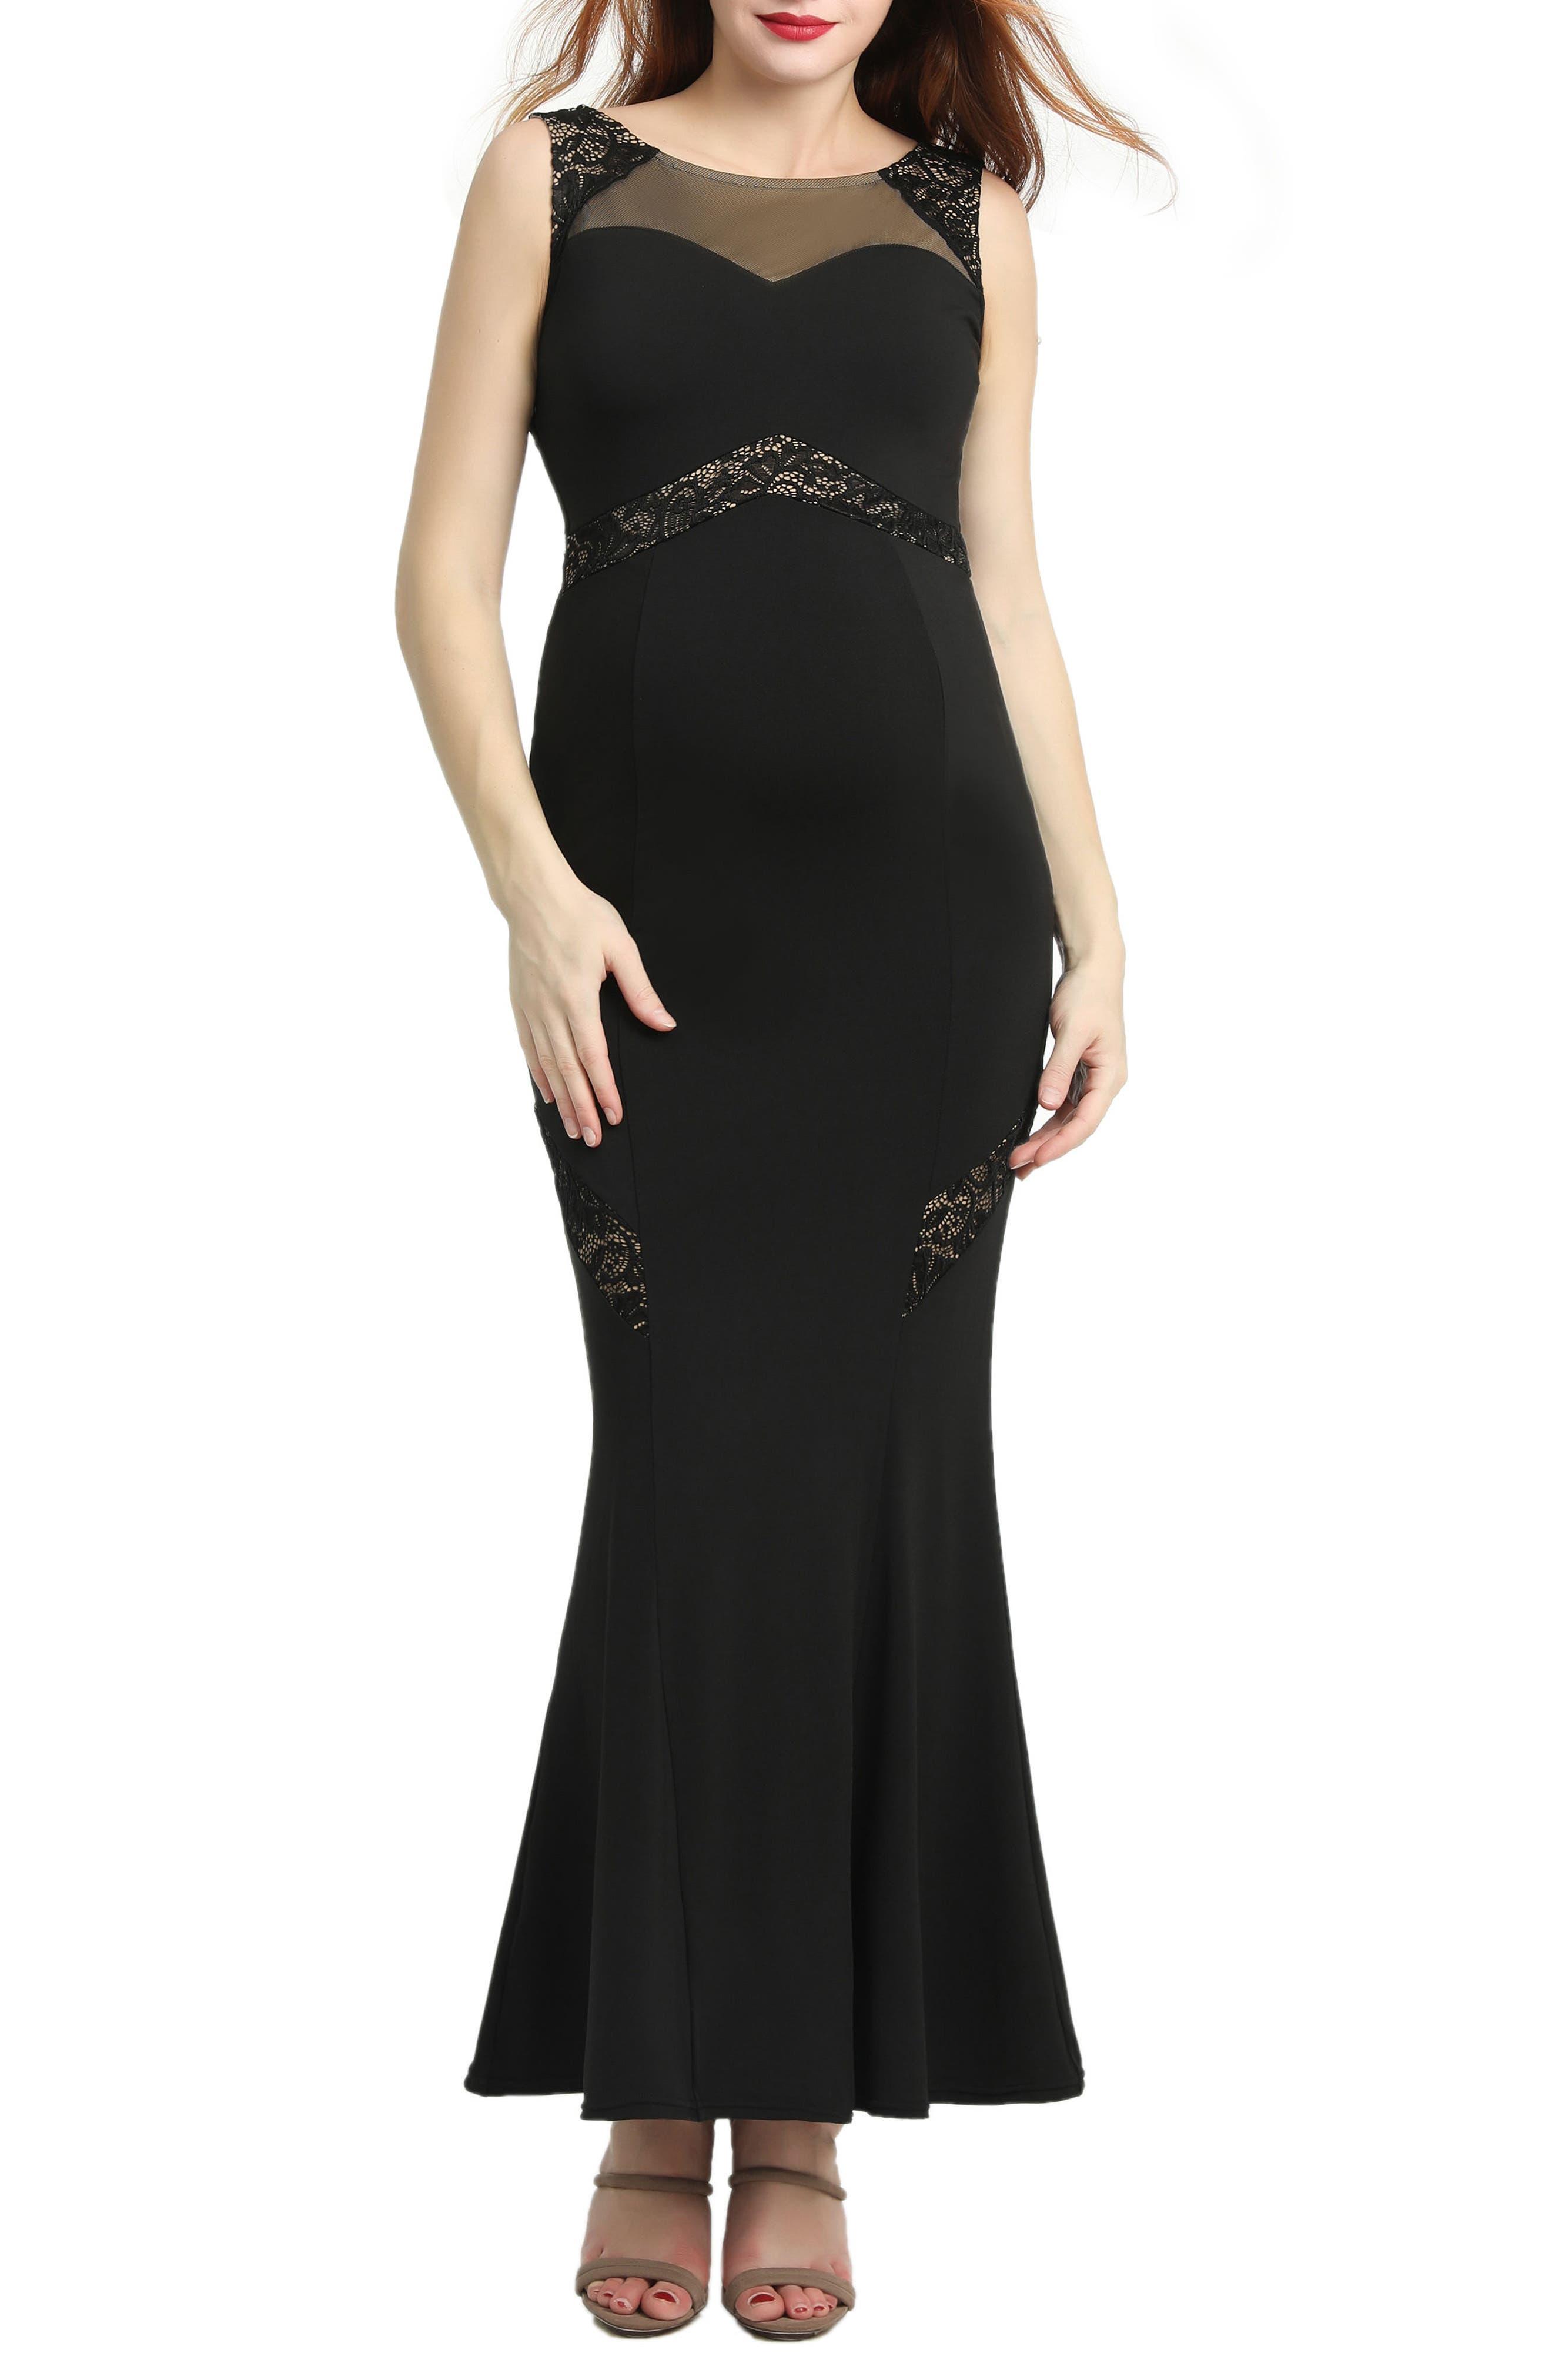 KIMI AND KAI Corinne Lace Trim Maternity Mermaid Maxi Dress, Main, color, BLACK